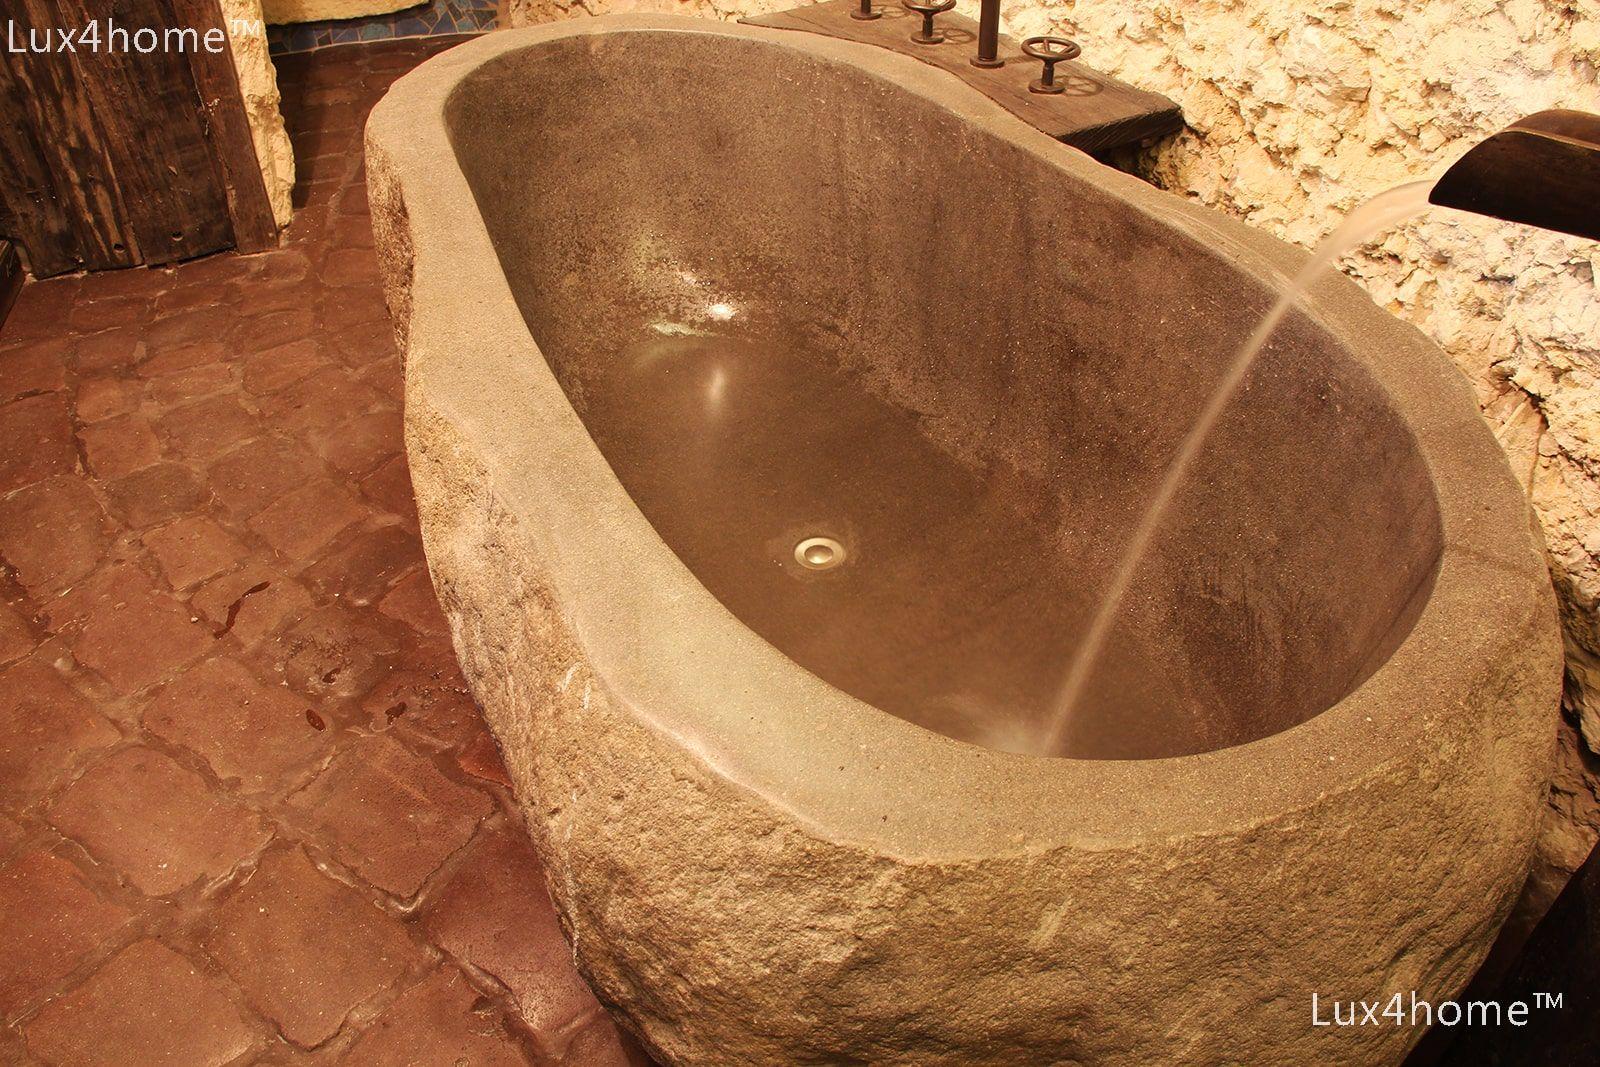 Stone Tubs For Sale Stone Tub Stone Bathtub Bathtubs For Sale